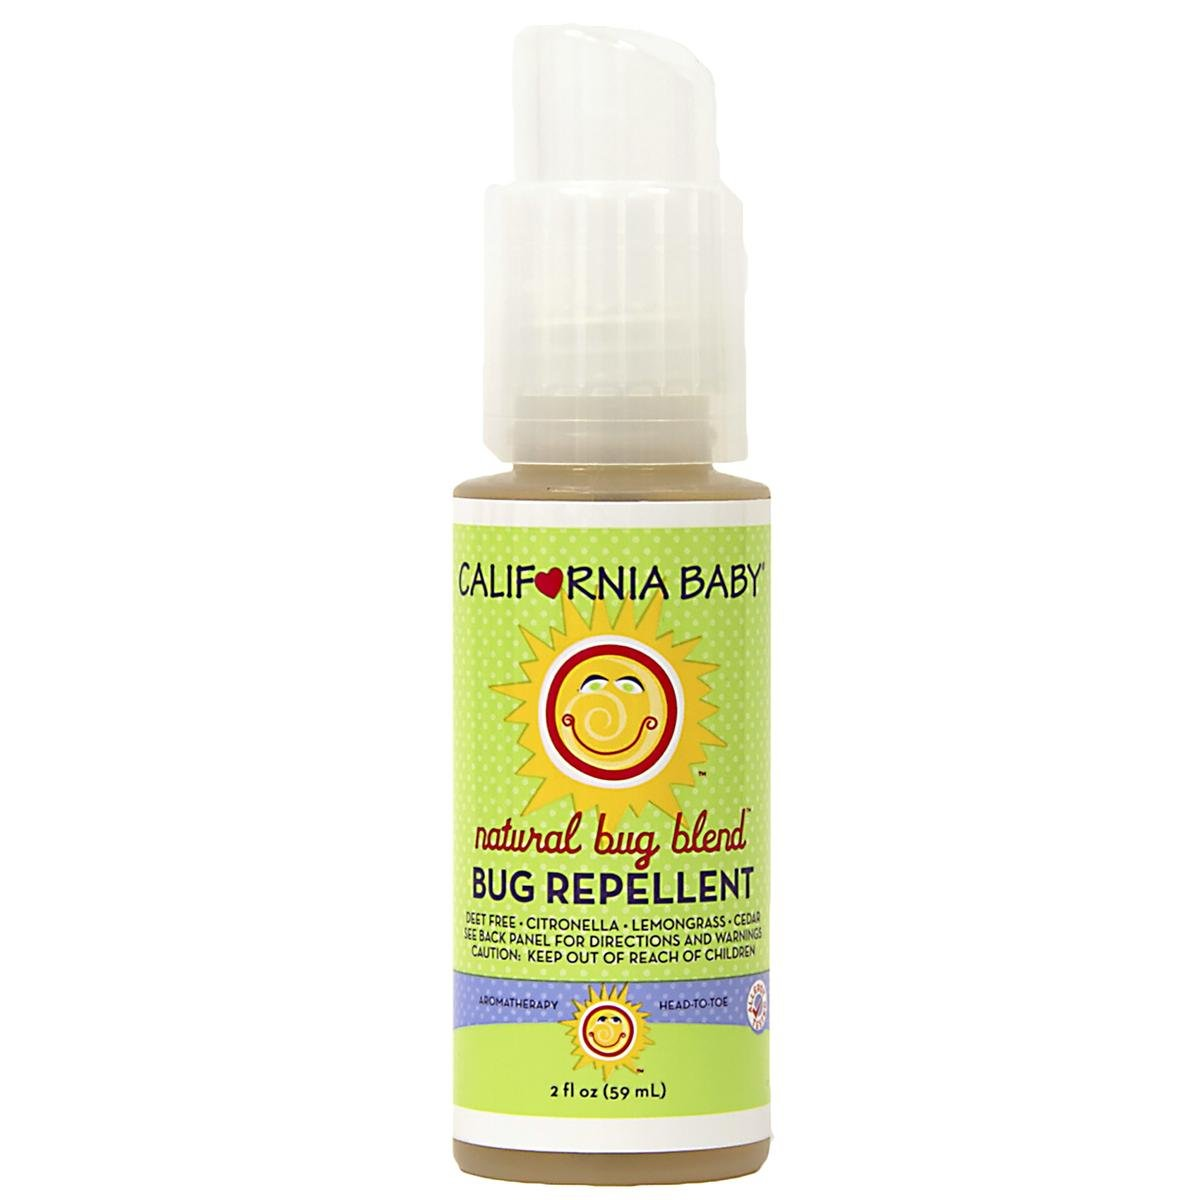 California Baby Natural Bug Blend Bug Repellent Spray - 2 oz